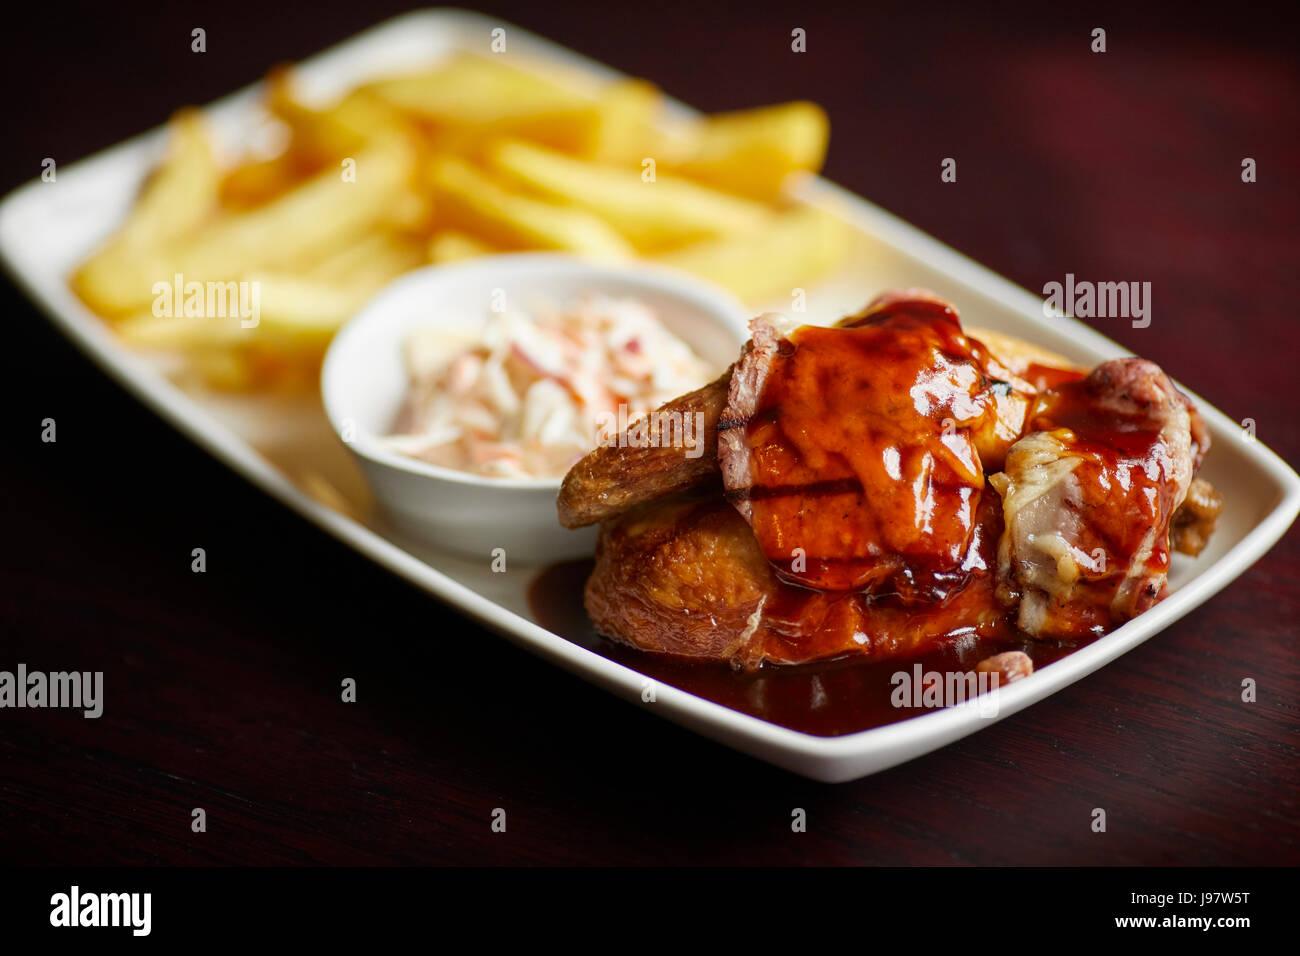 Traditionelle Pub Essen, Huhn in Soße und Pommes Frites. Stockbild